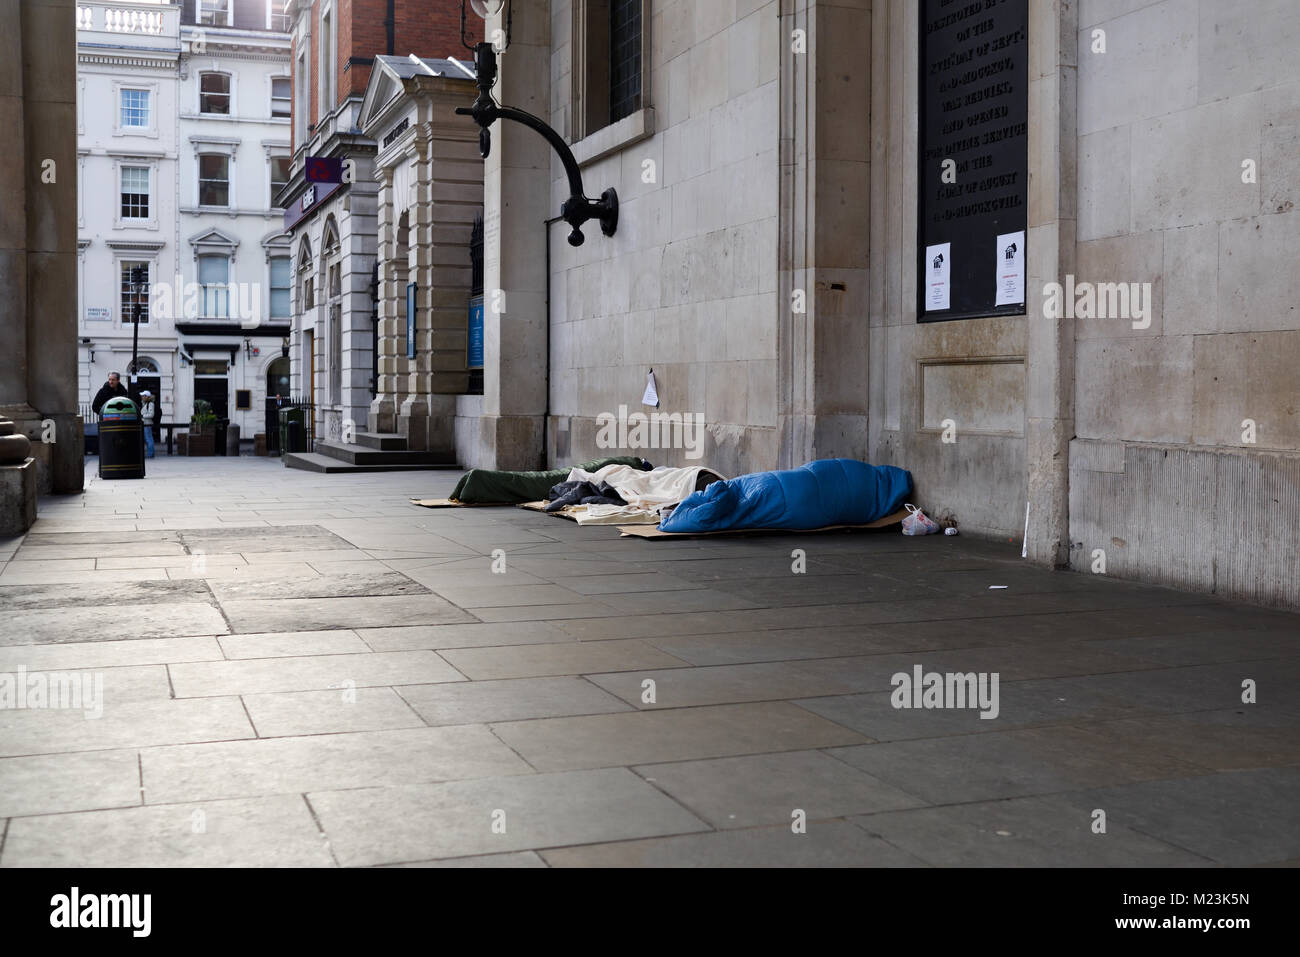 Homeless Sleeping Rough London,UK. - Stock Image